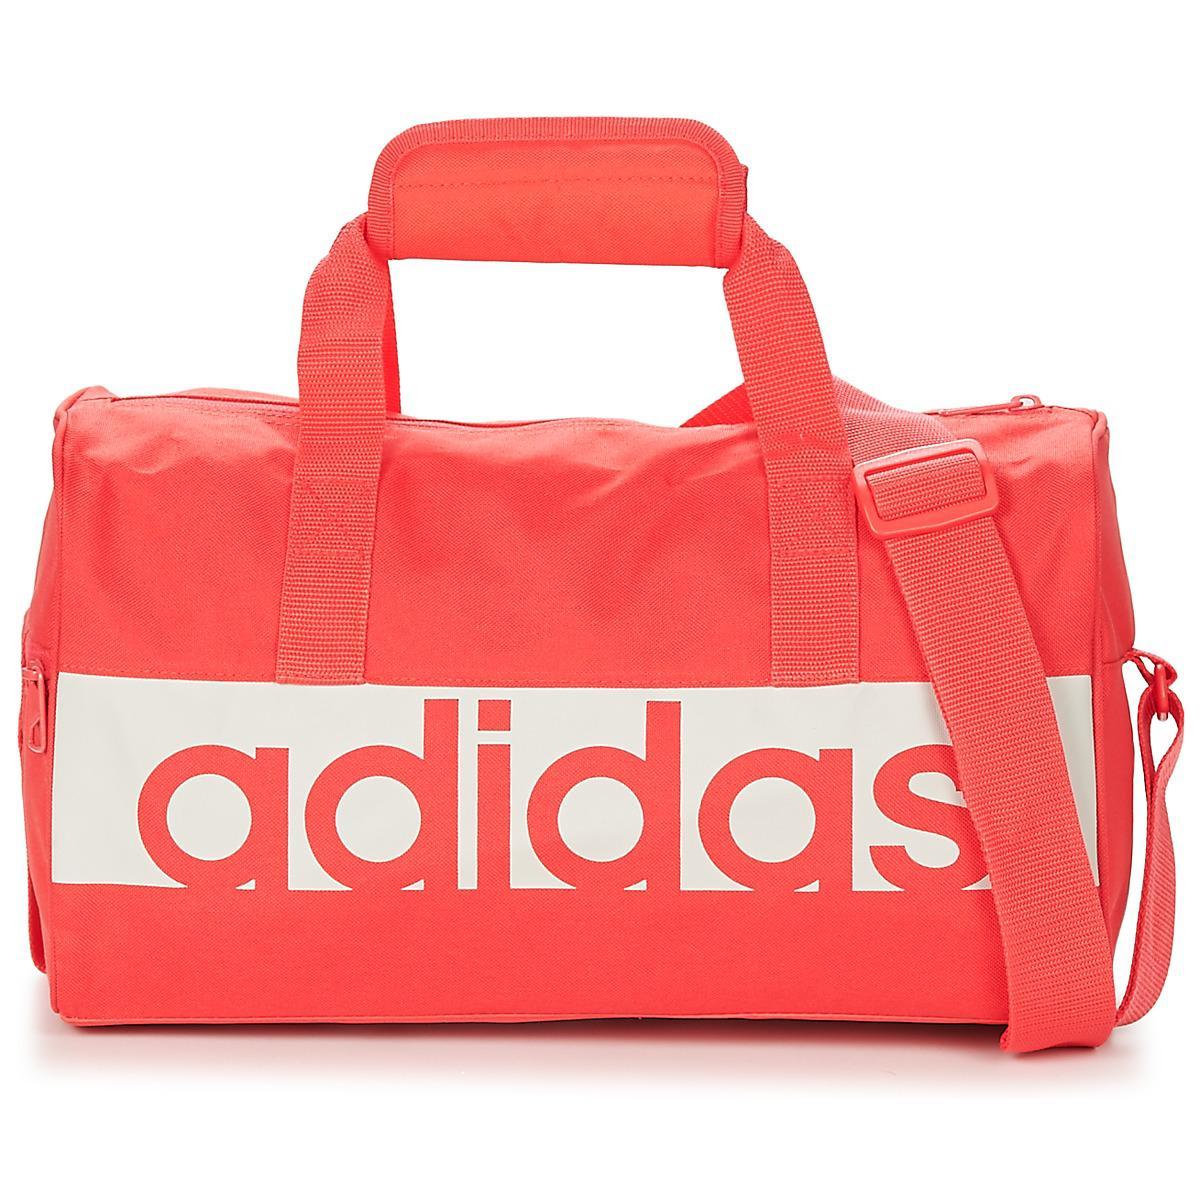 513238d3da14 adidas Linear Teambag Extrasmall Women's Sports Bag In Pink - Lyst